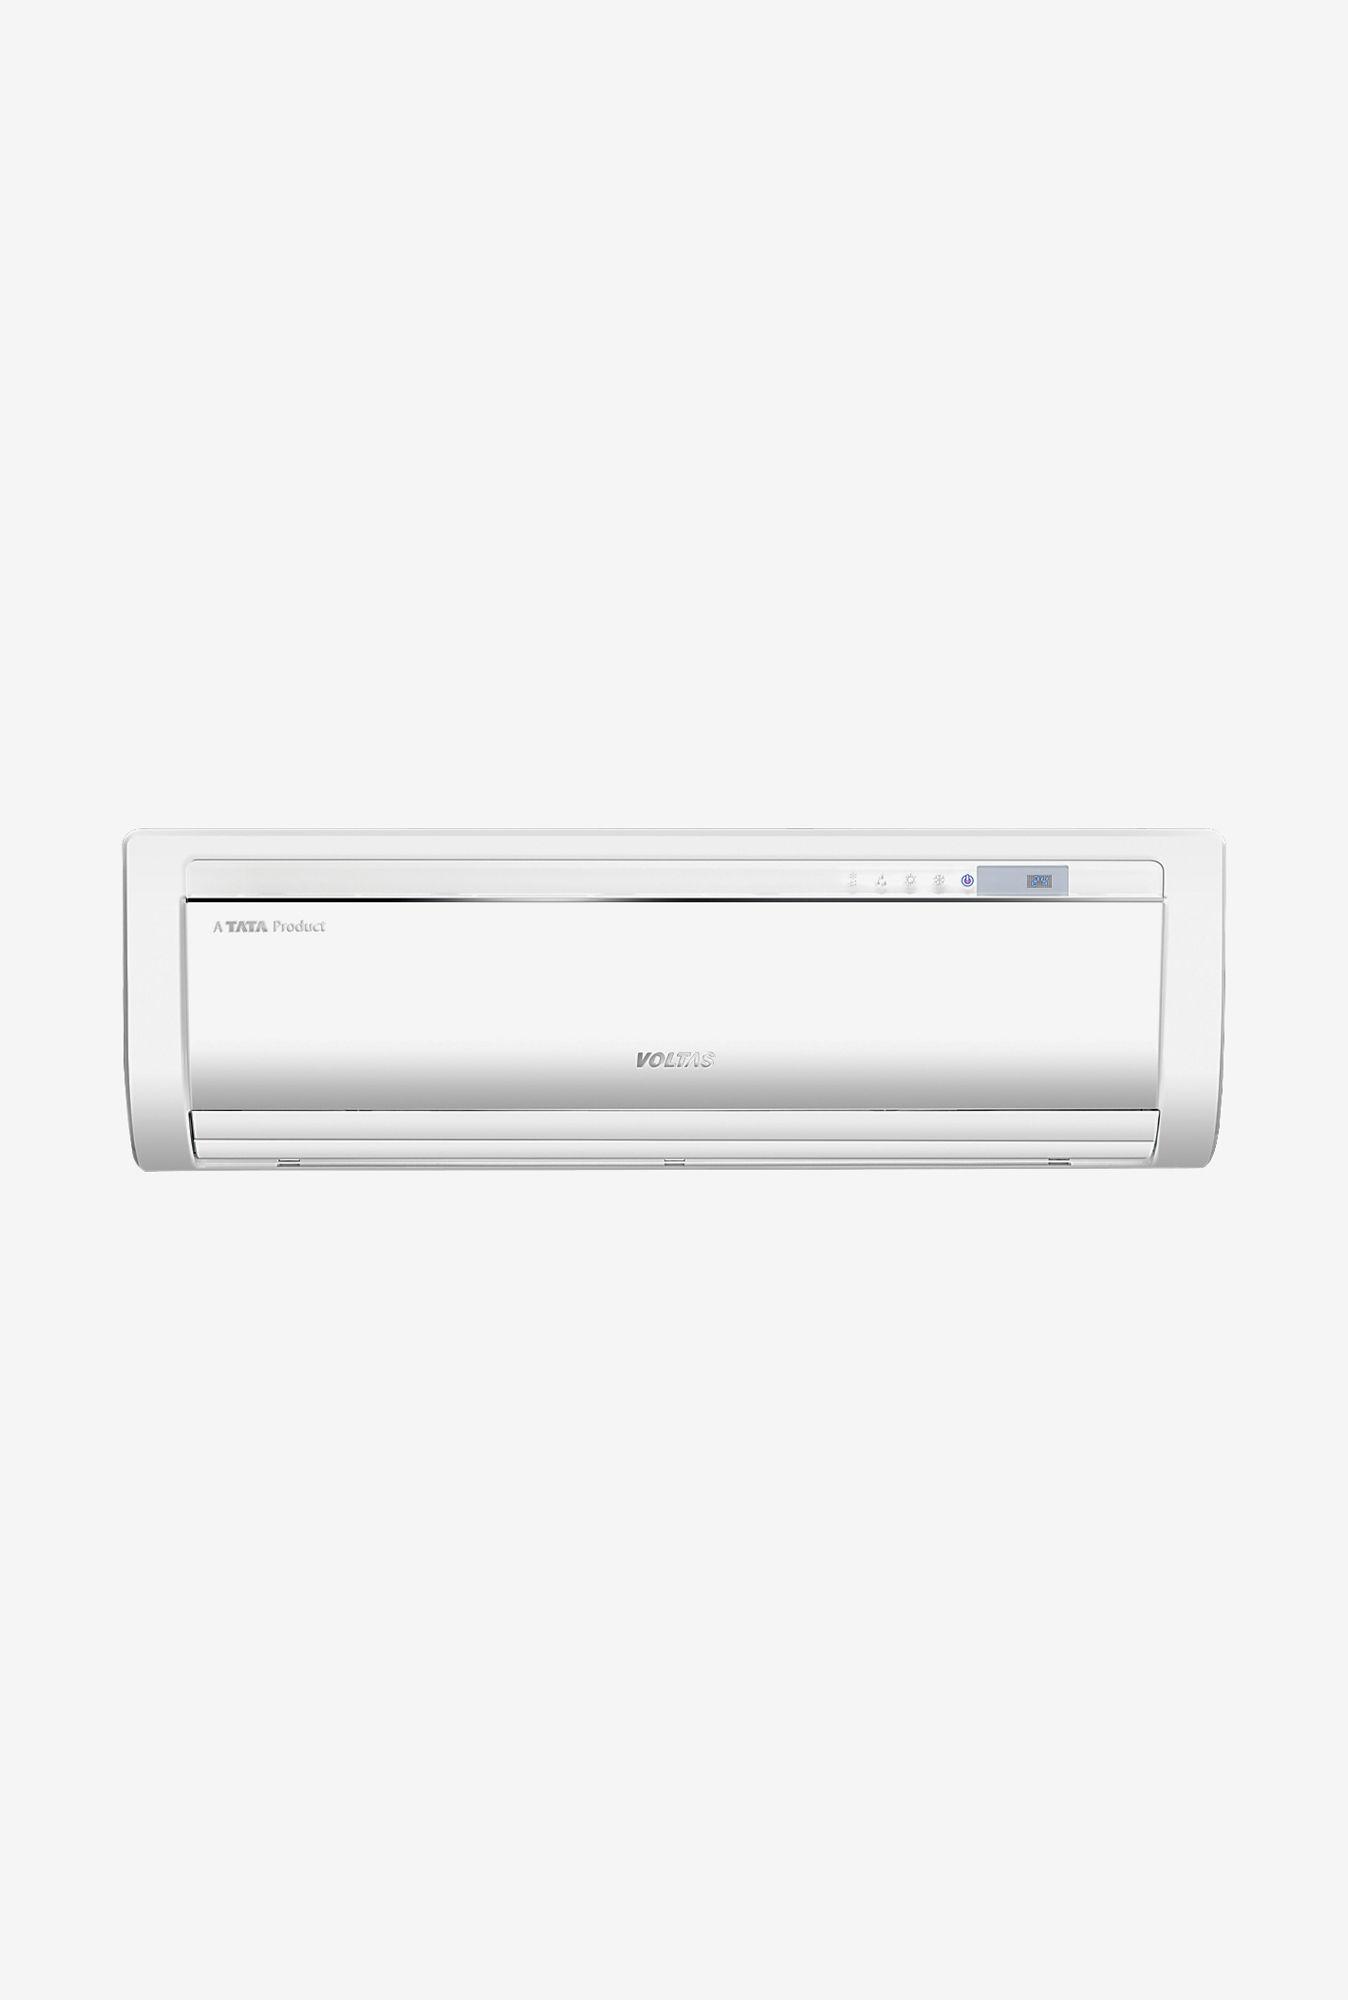 Voltas Magna 123 MYd 1 Ton 3 Star Split Air Conditioner